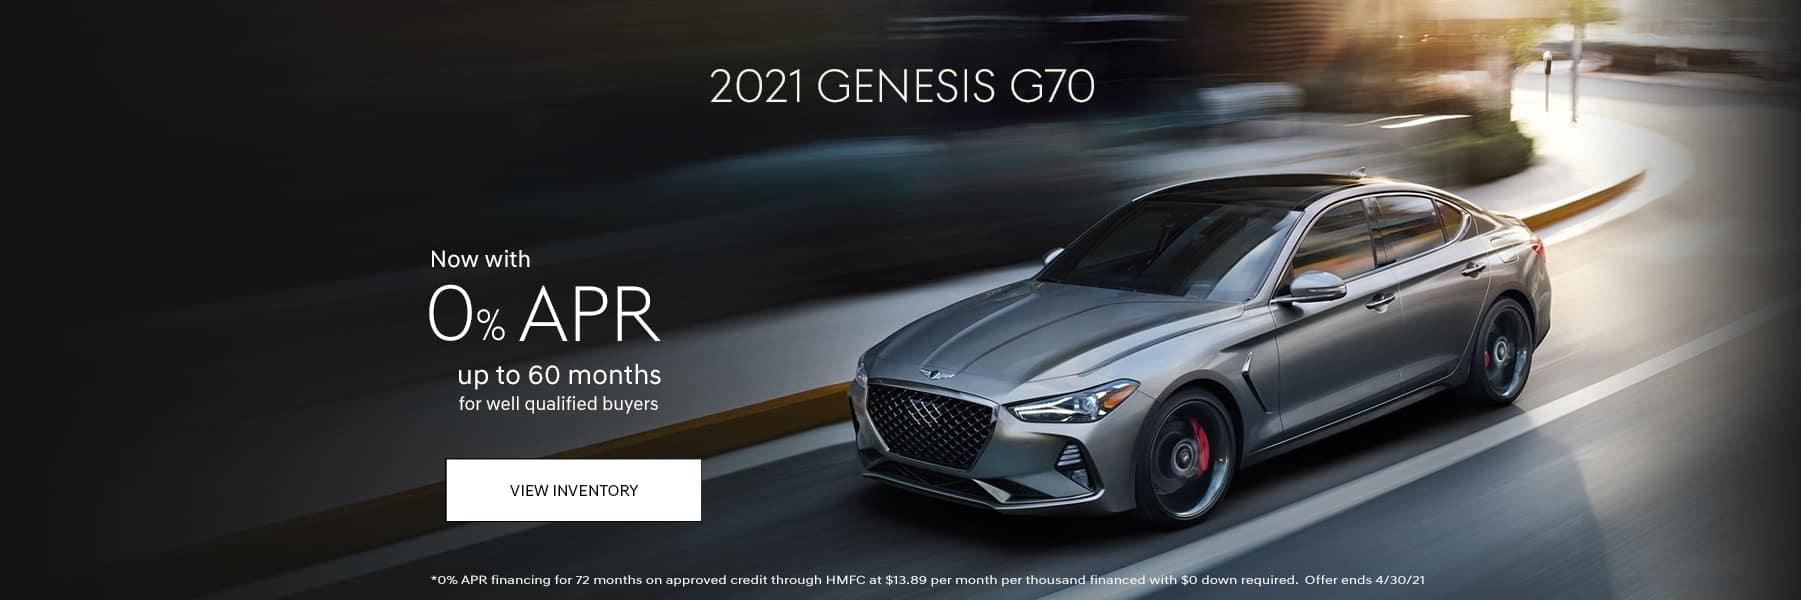 2021-Genesis-G70-Apr21